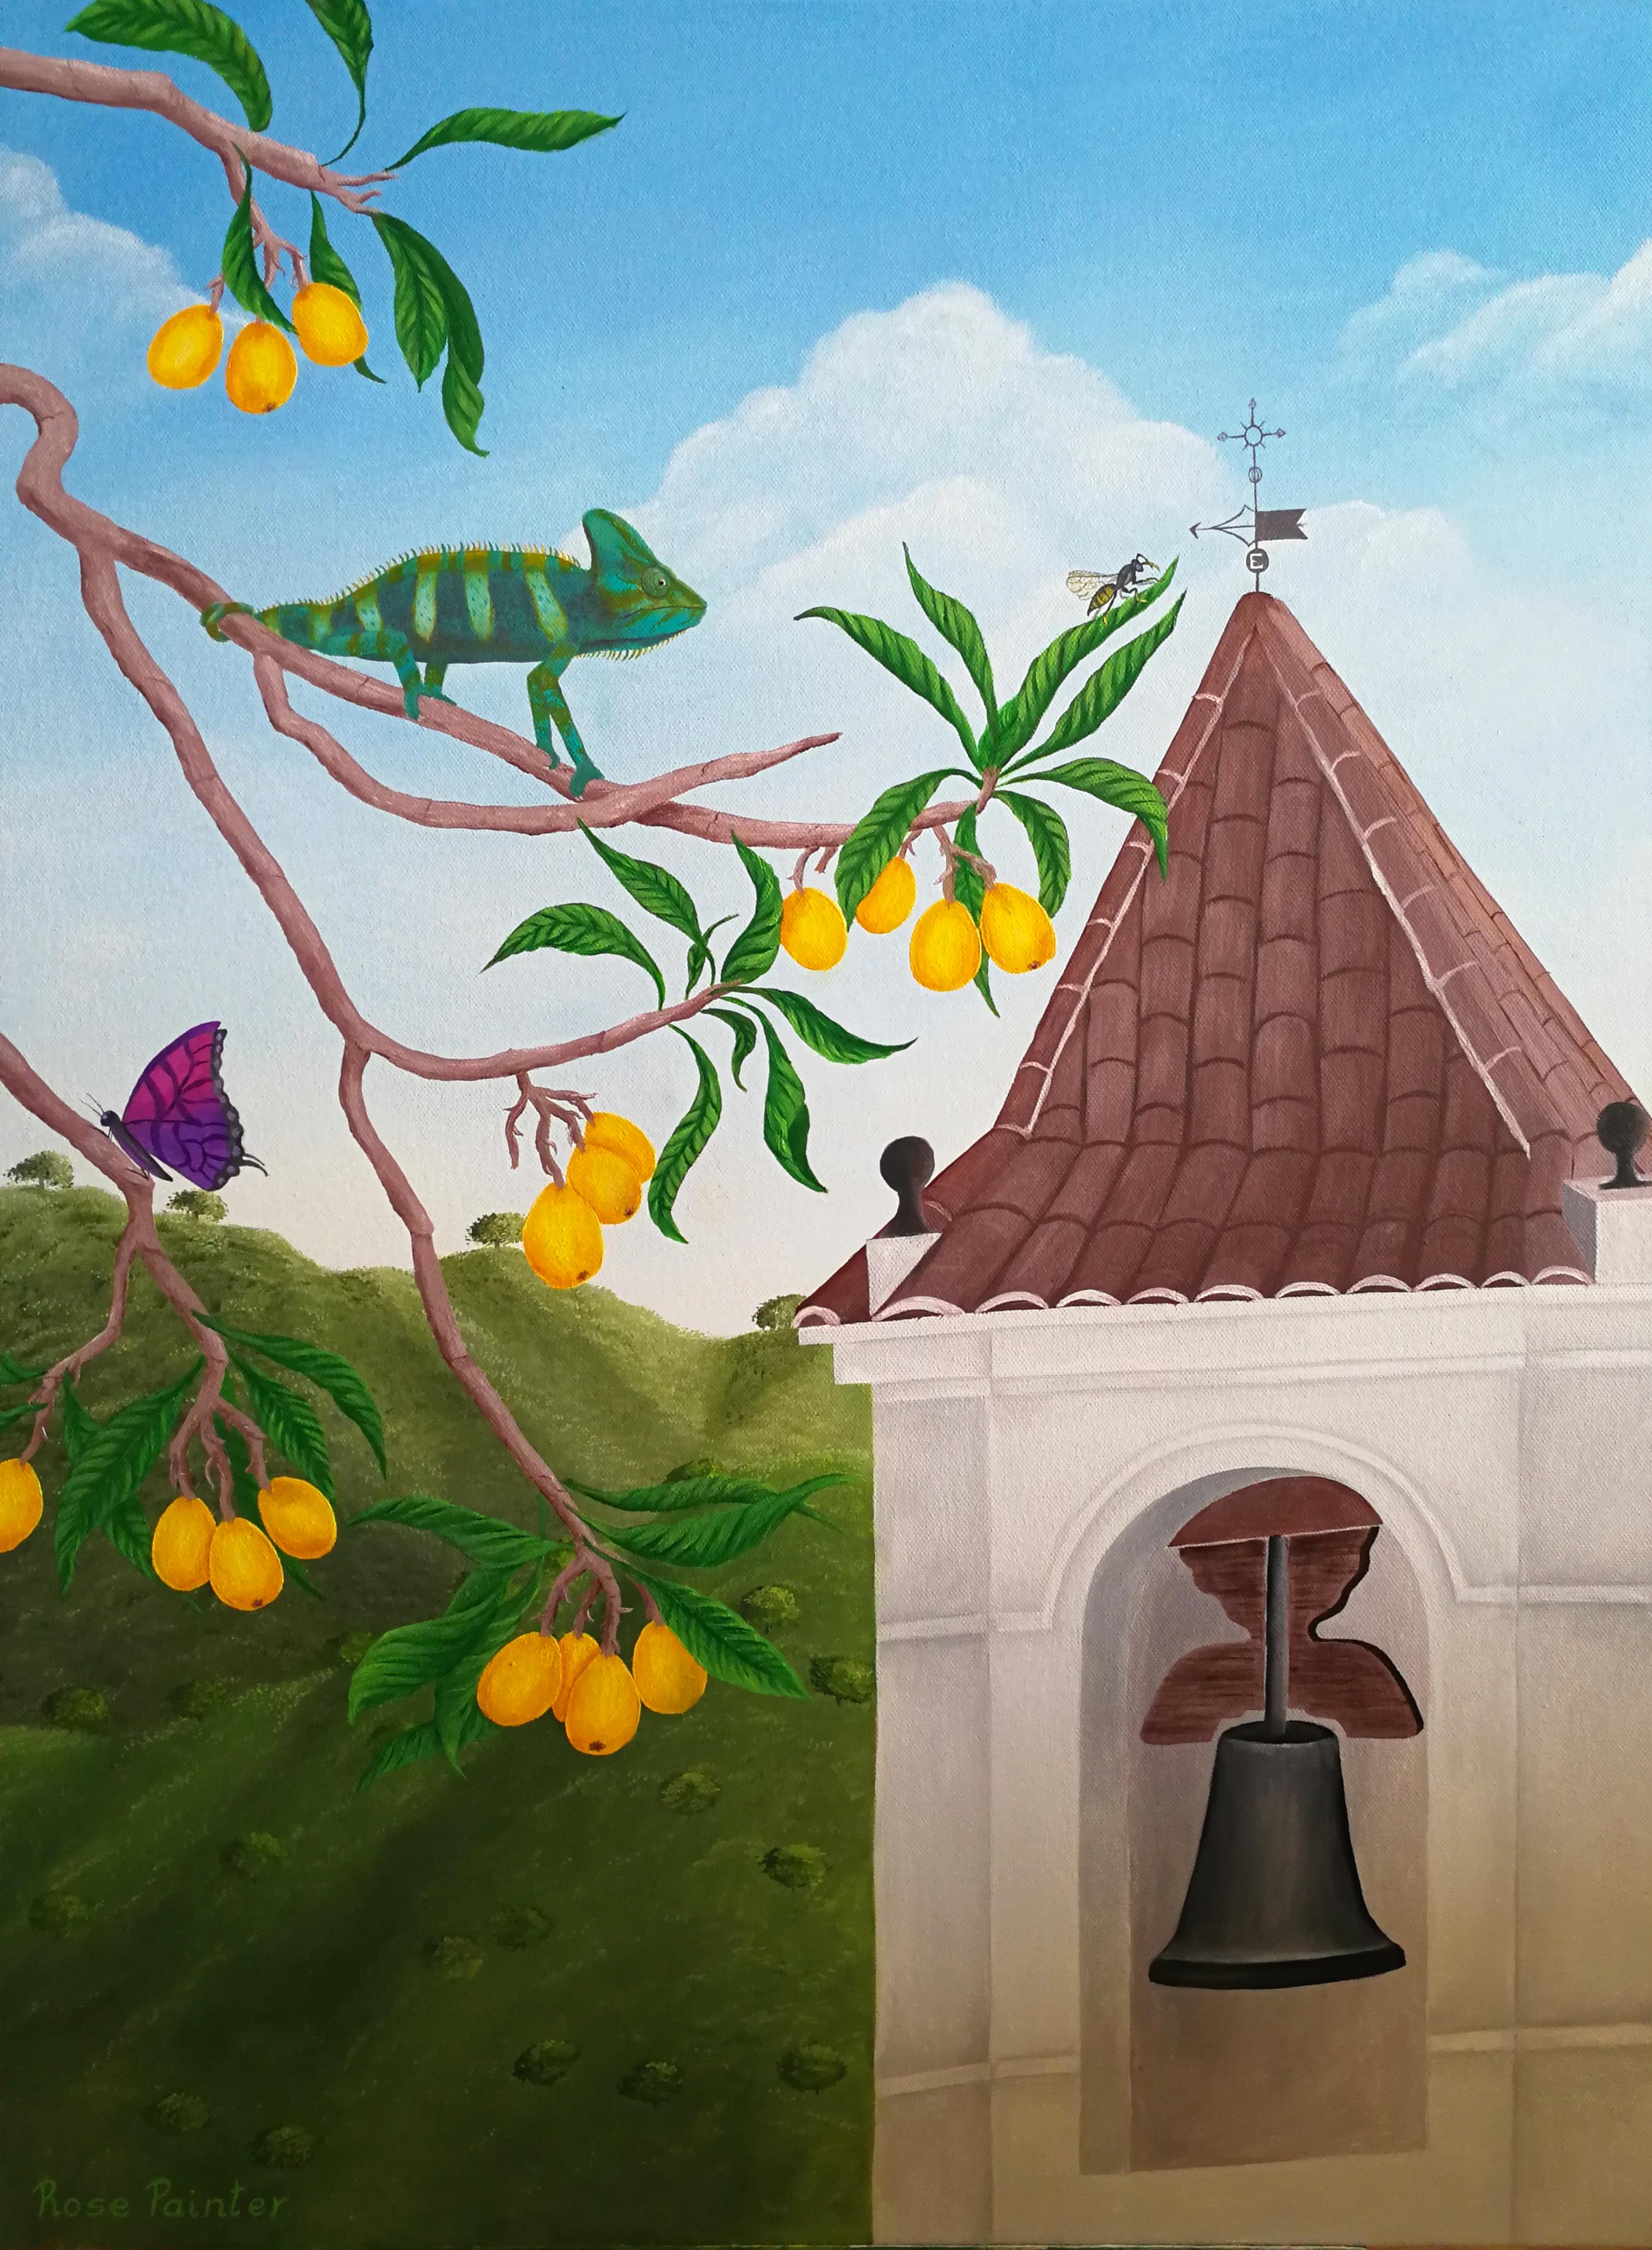 Tiempo de nísperos - Oil painting